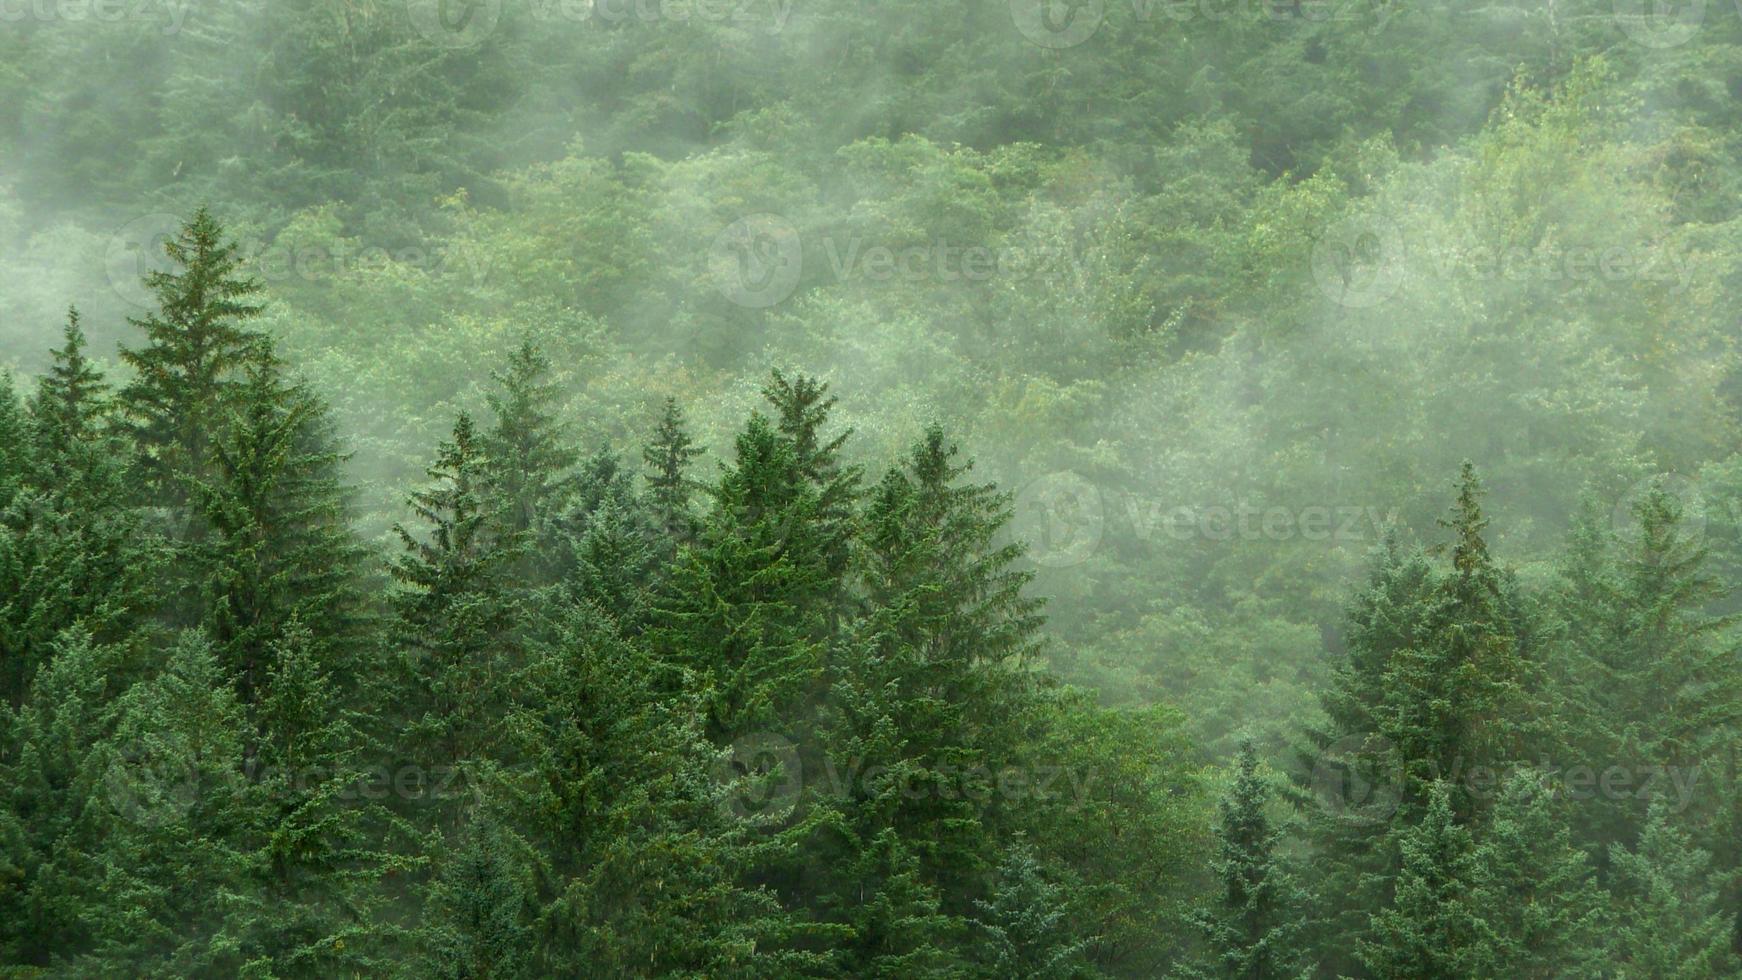 Evergreen Forest in Mist Background photo